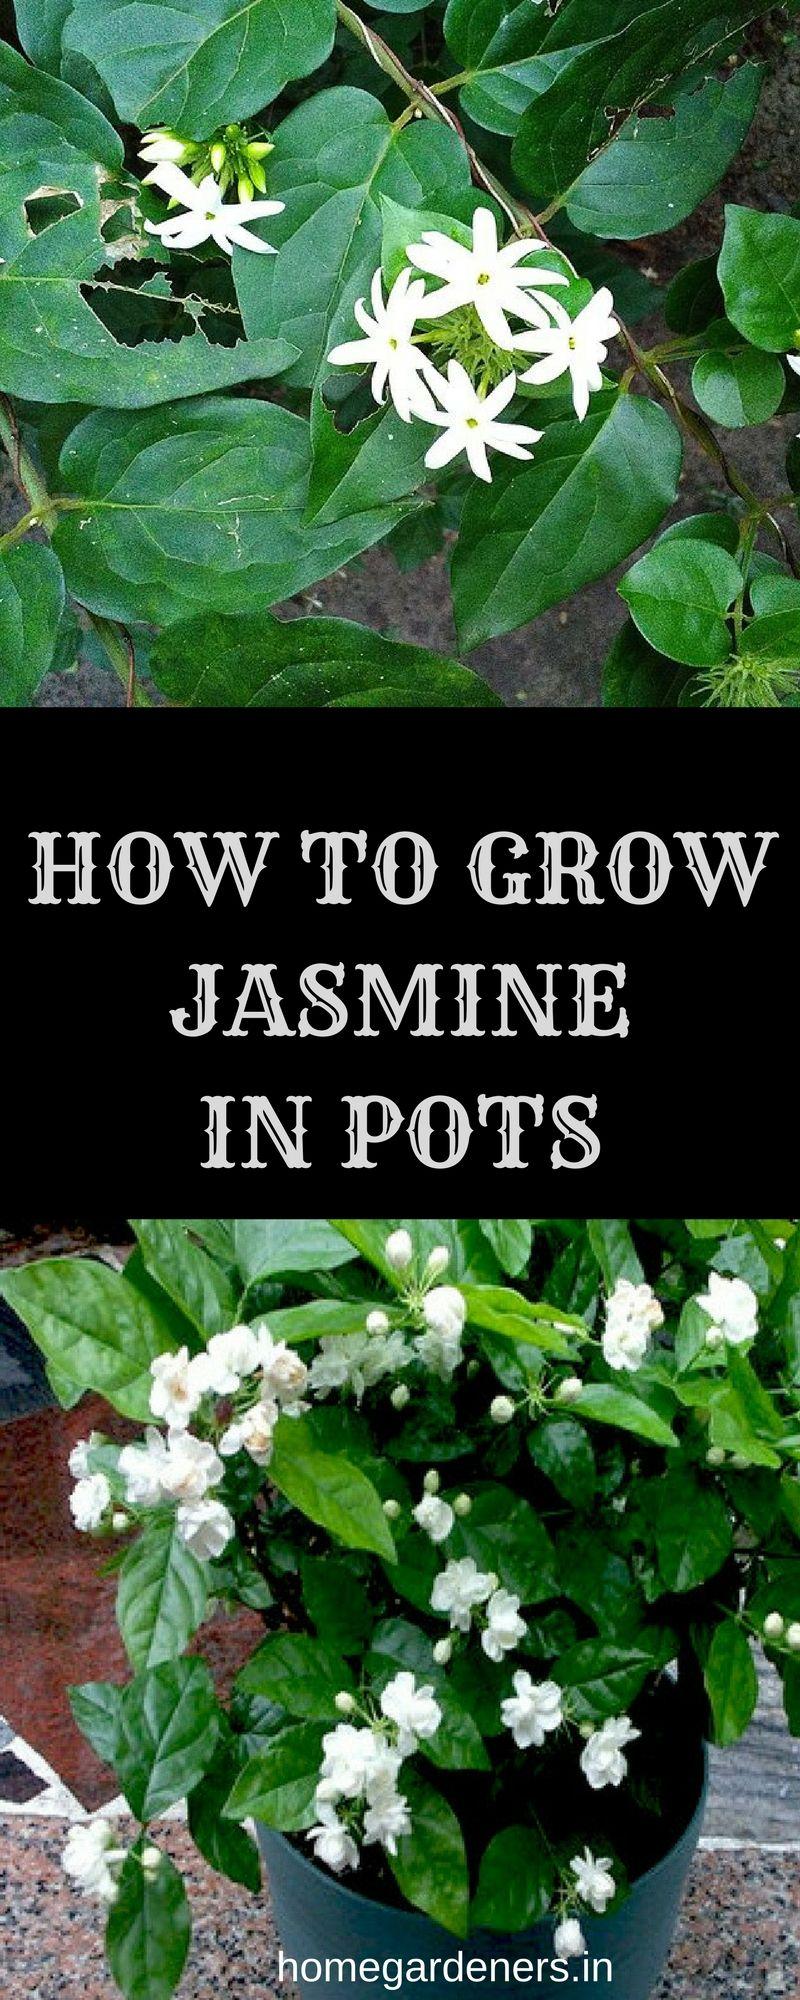 How to grow and care for jasmine plant flowering plants jasmine flowers izmirmasajfo